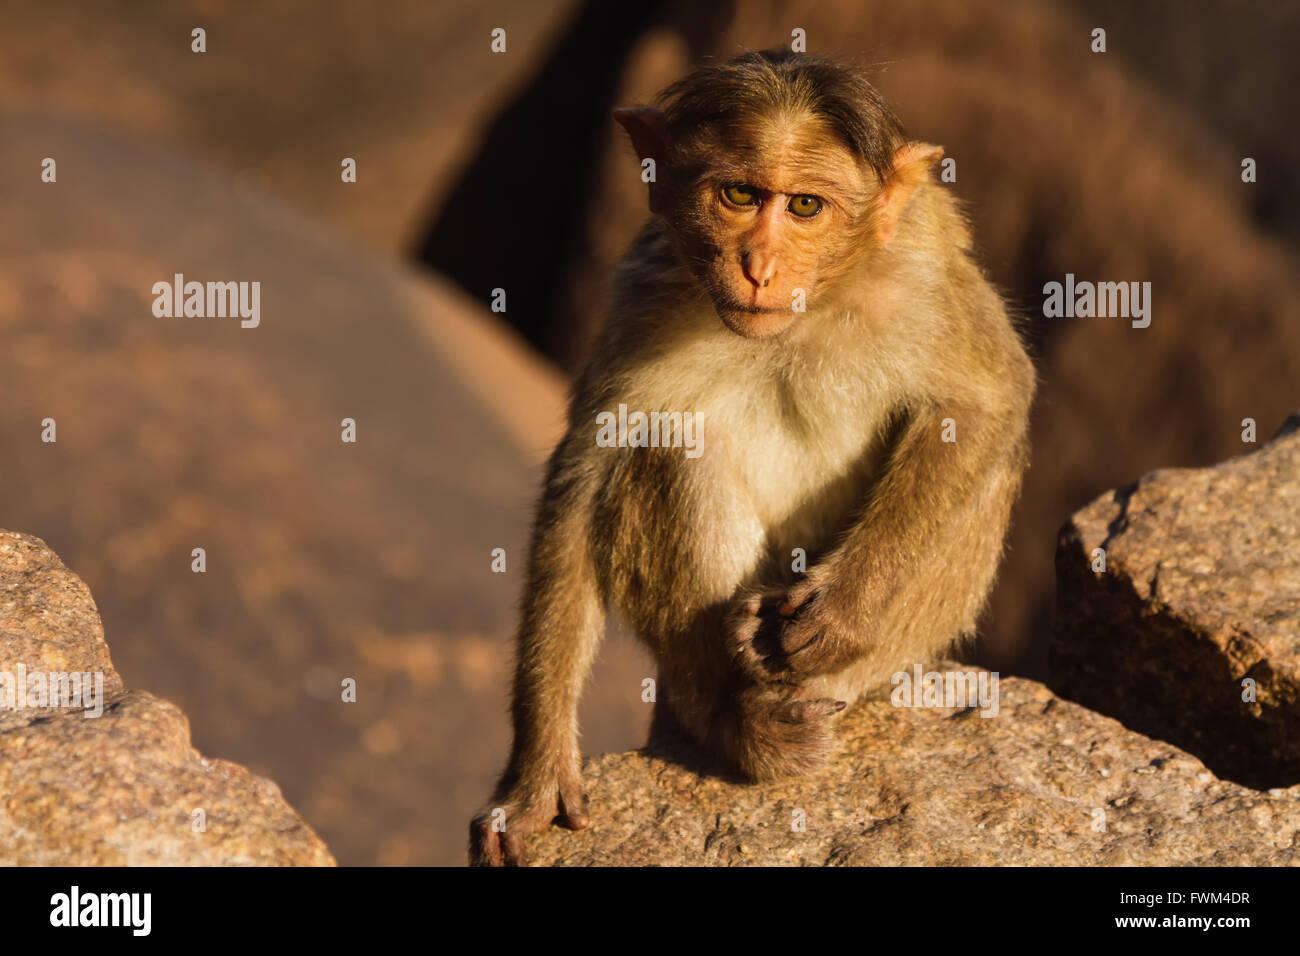 Portrait Of Monkey On Rock - Stock Image